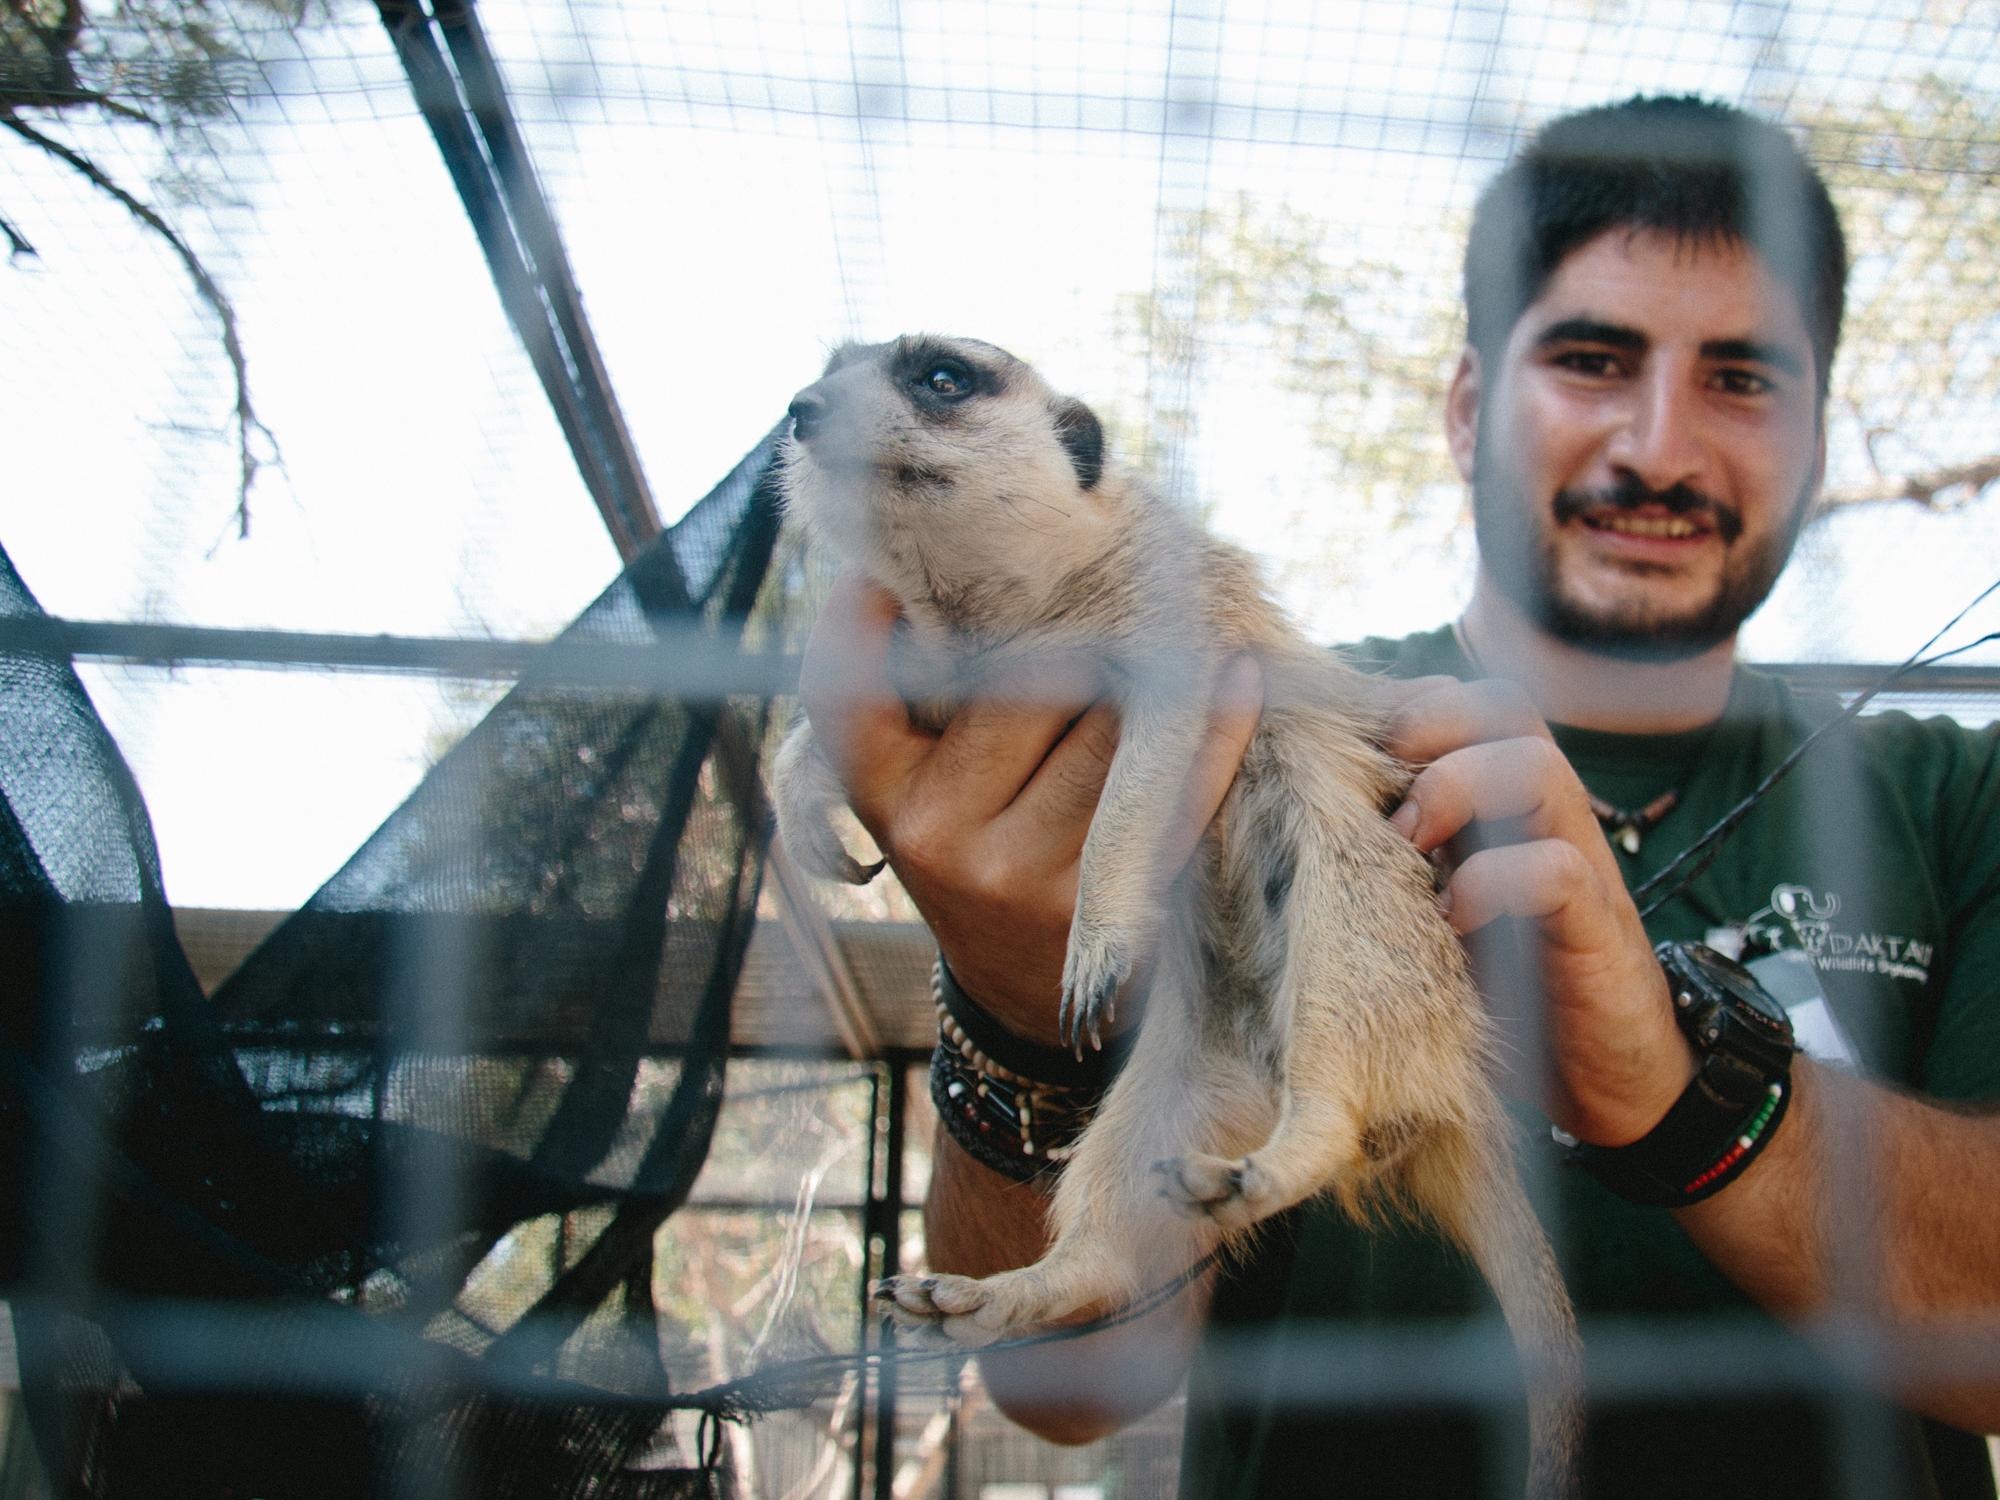 A volunteer shows off one of Daktari's many rescued meerkats